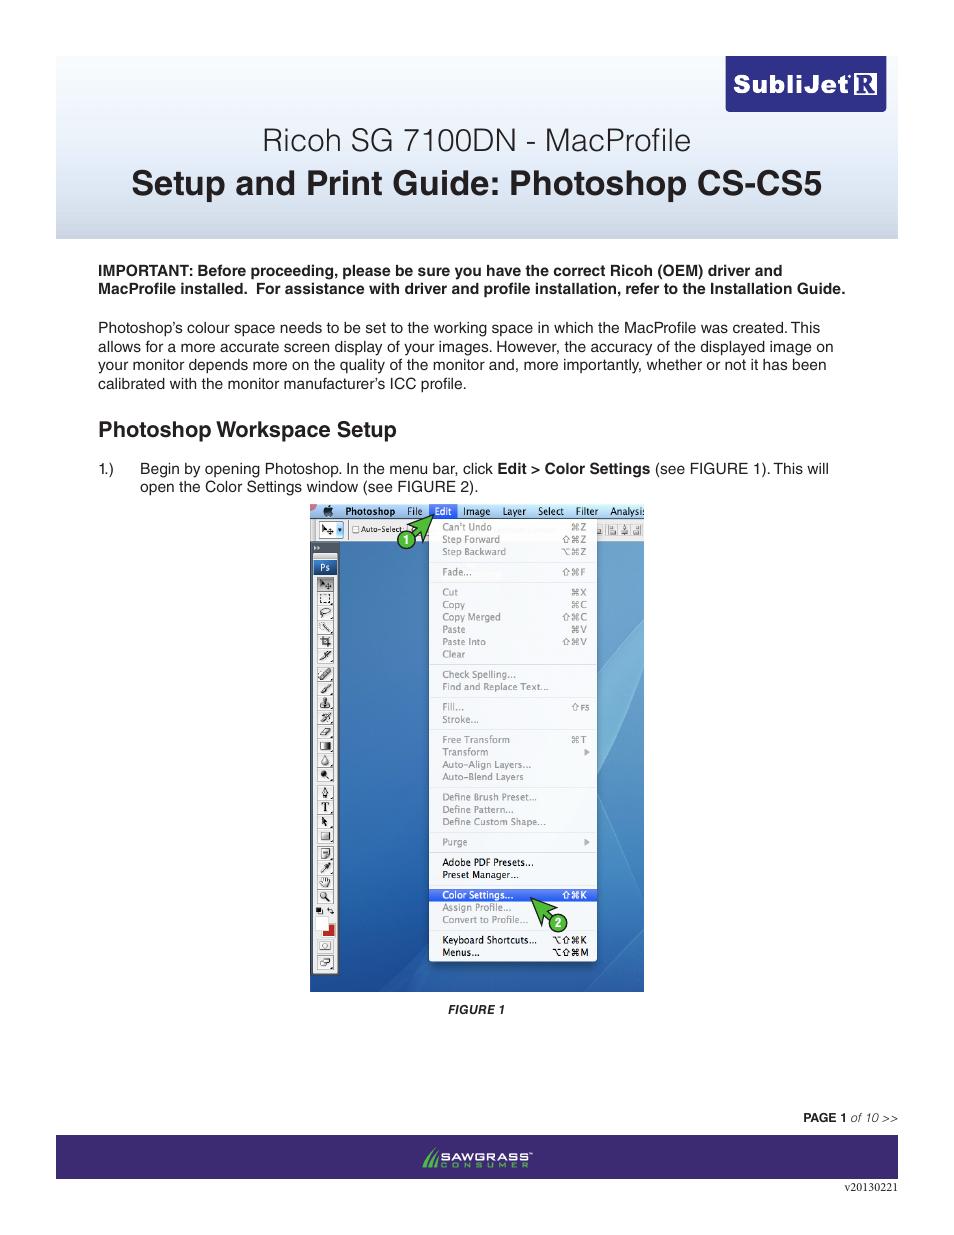 Xpres SubliJet R Ricoh SG7100DN (Mac ICC Profile Setup